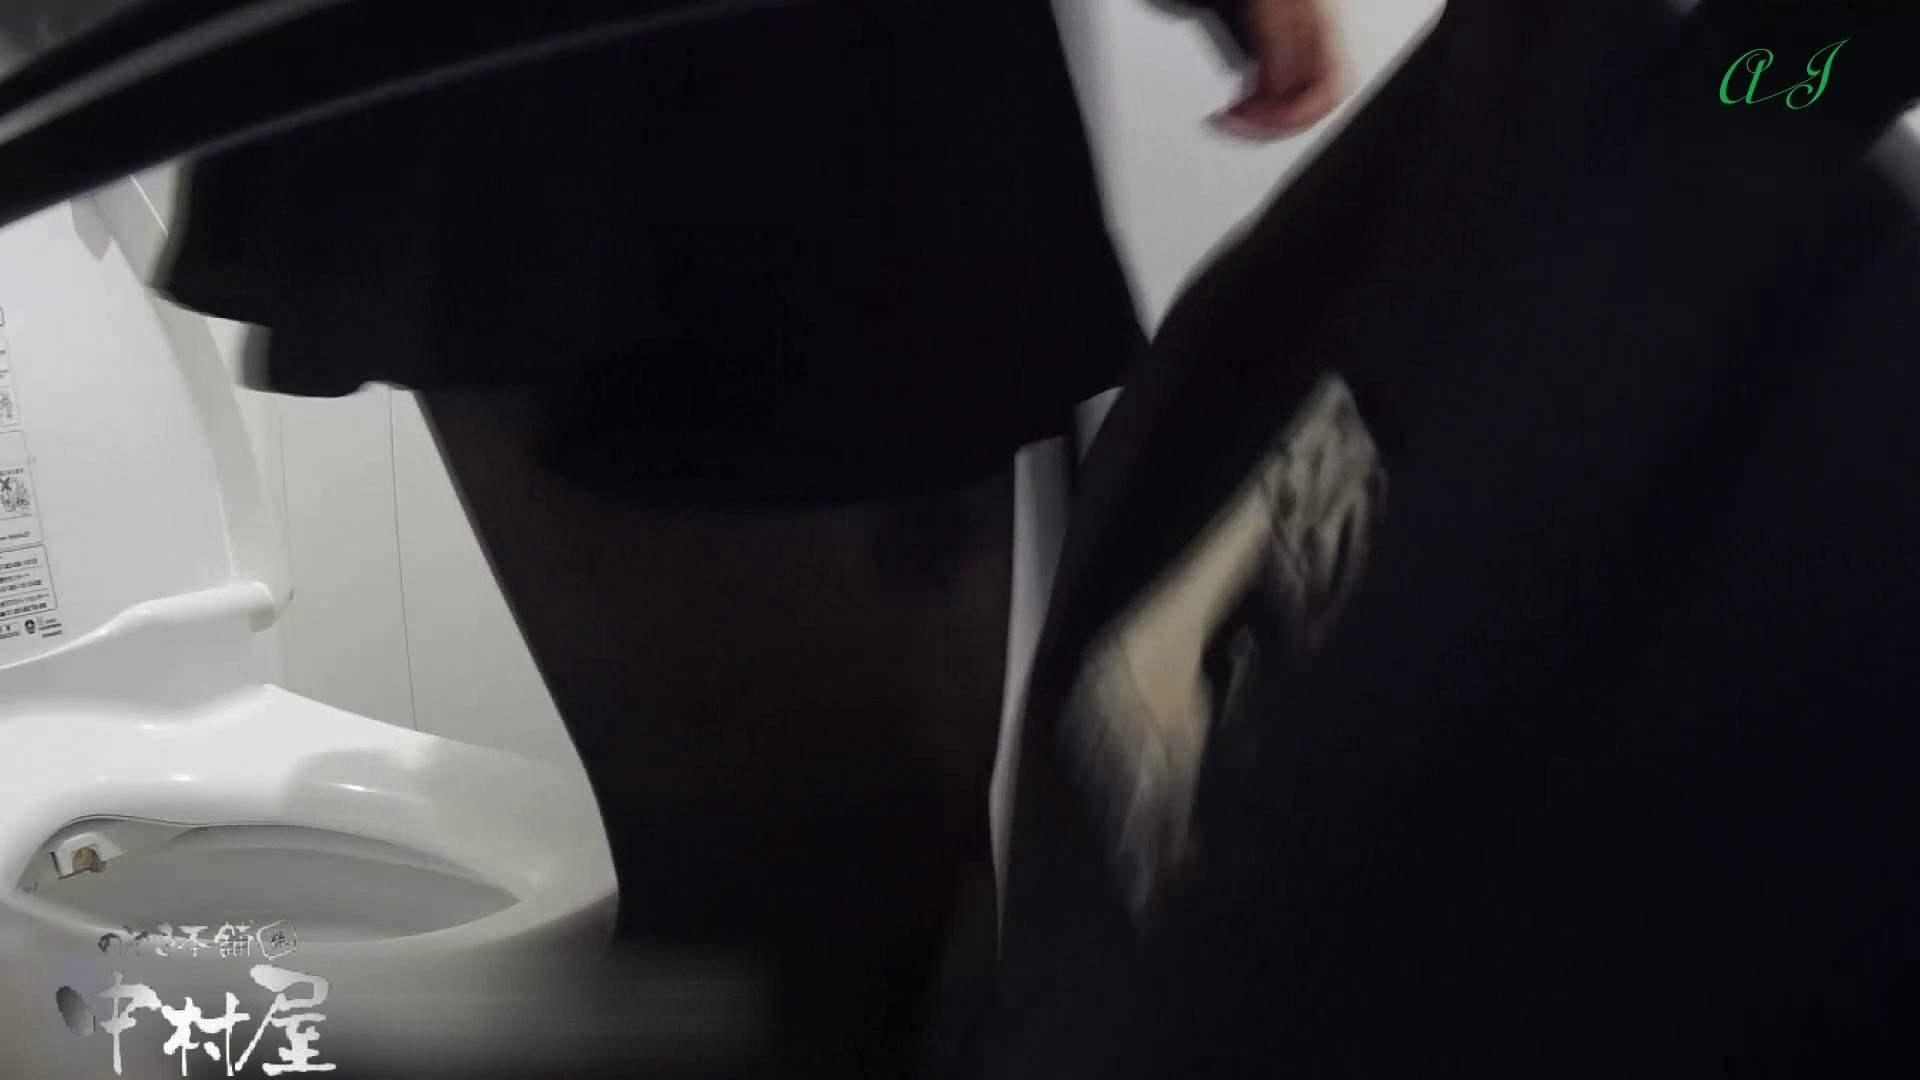 有名大学女性洗面所 vol.79 新アングル丸見え 前編 和式 オマンコ無修正動画無料 81連発 79